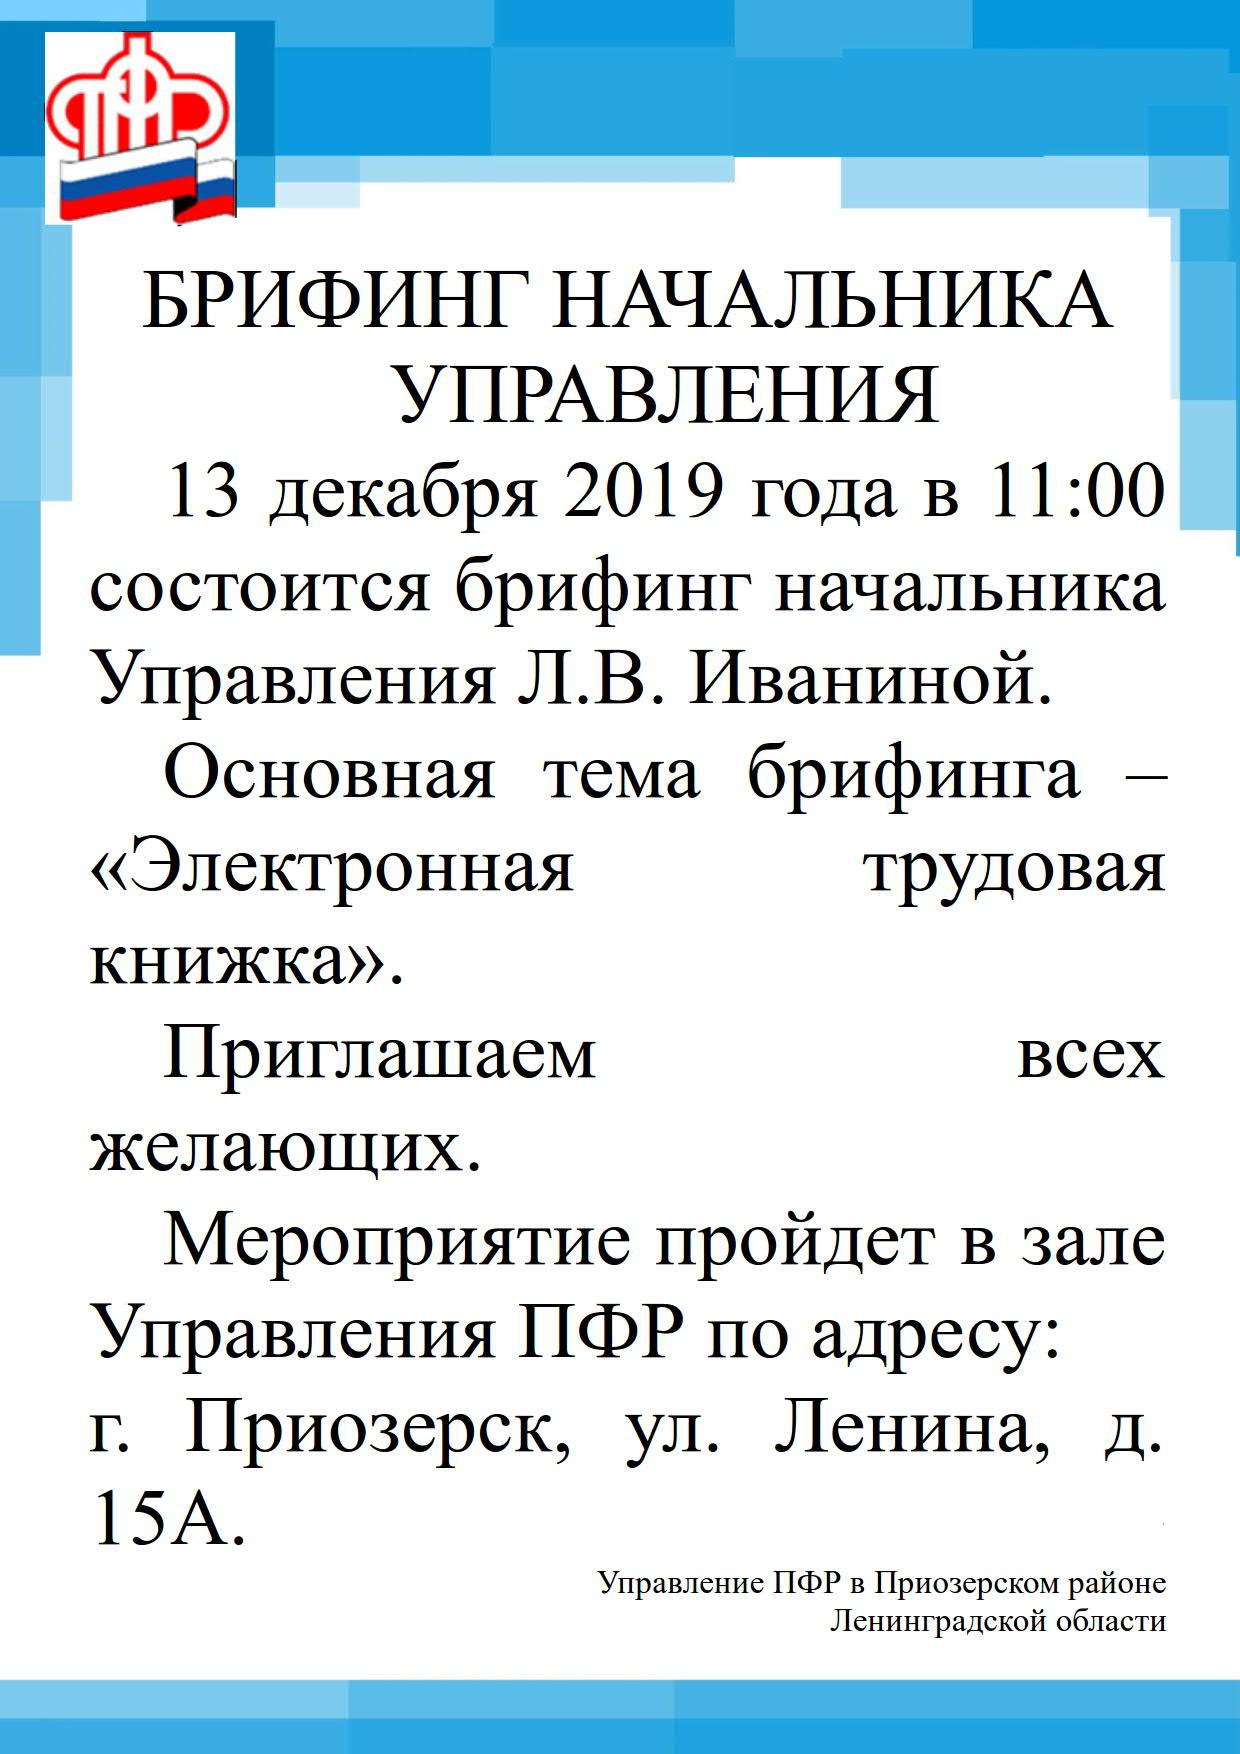 БРИФИНГ НАЧАЛЬНИКА УПФР 131219_1